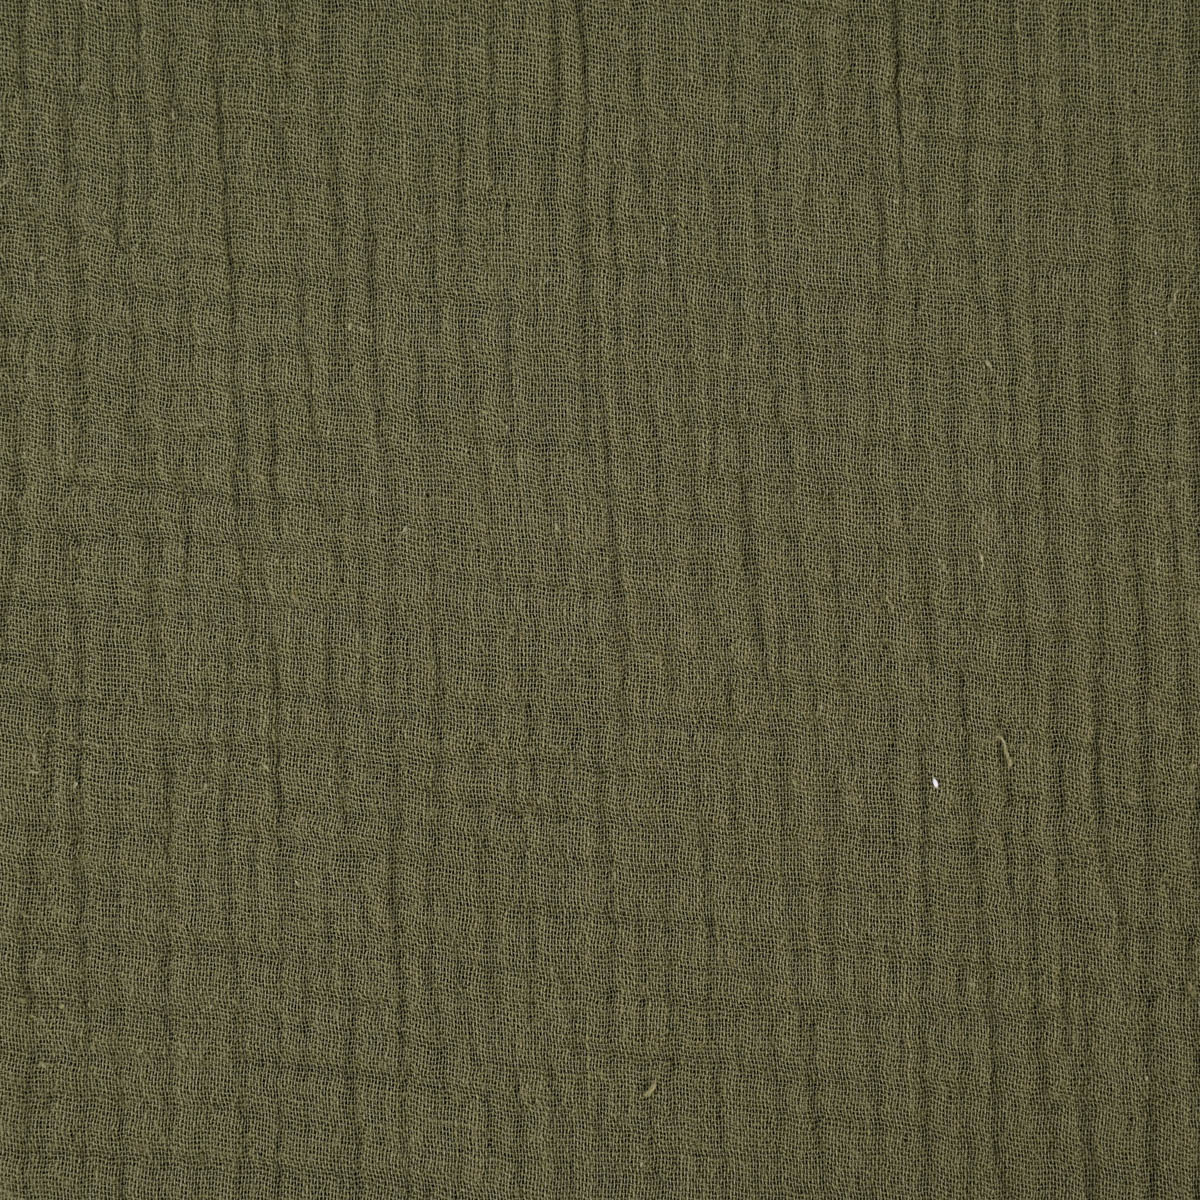 Double Gauze Musselin GOTS Bio Musselin Windelstoff einfarbig grün 1,30m Breite